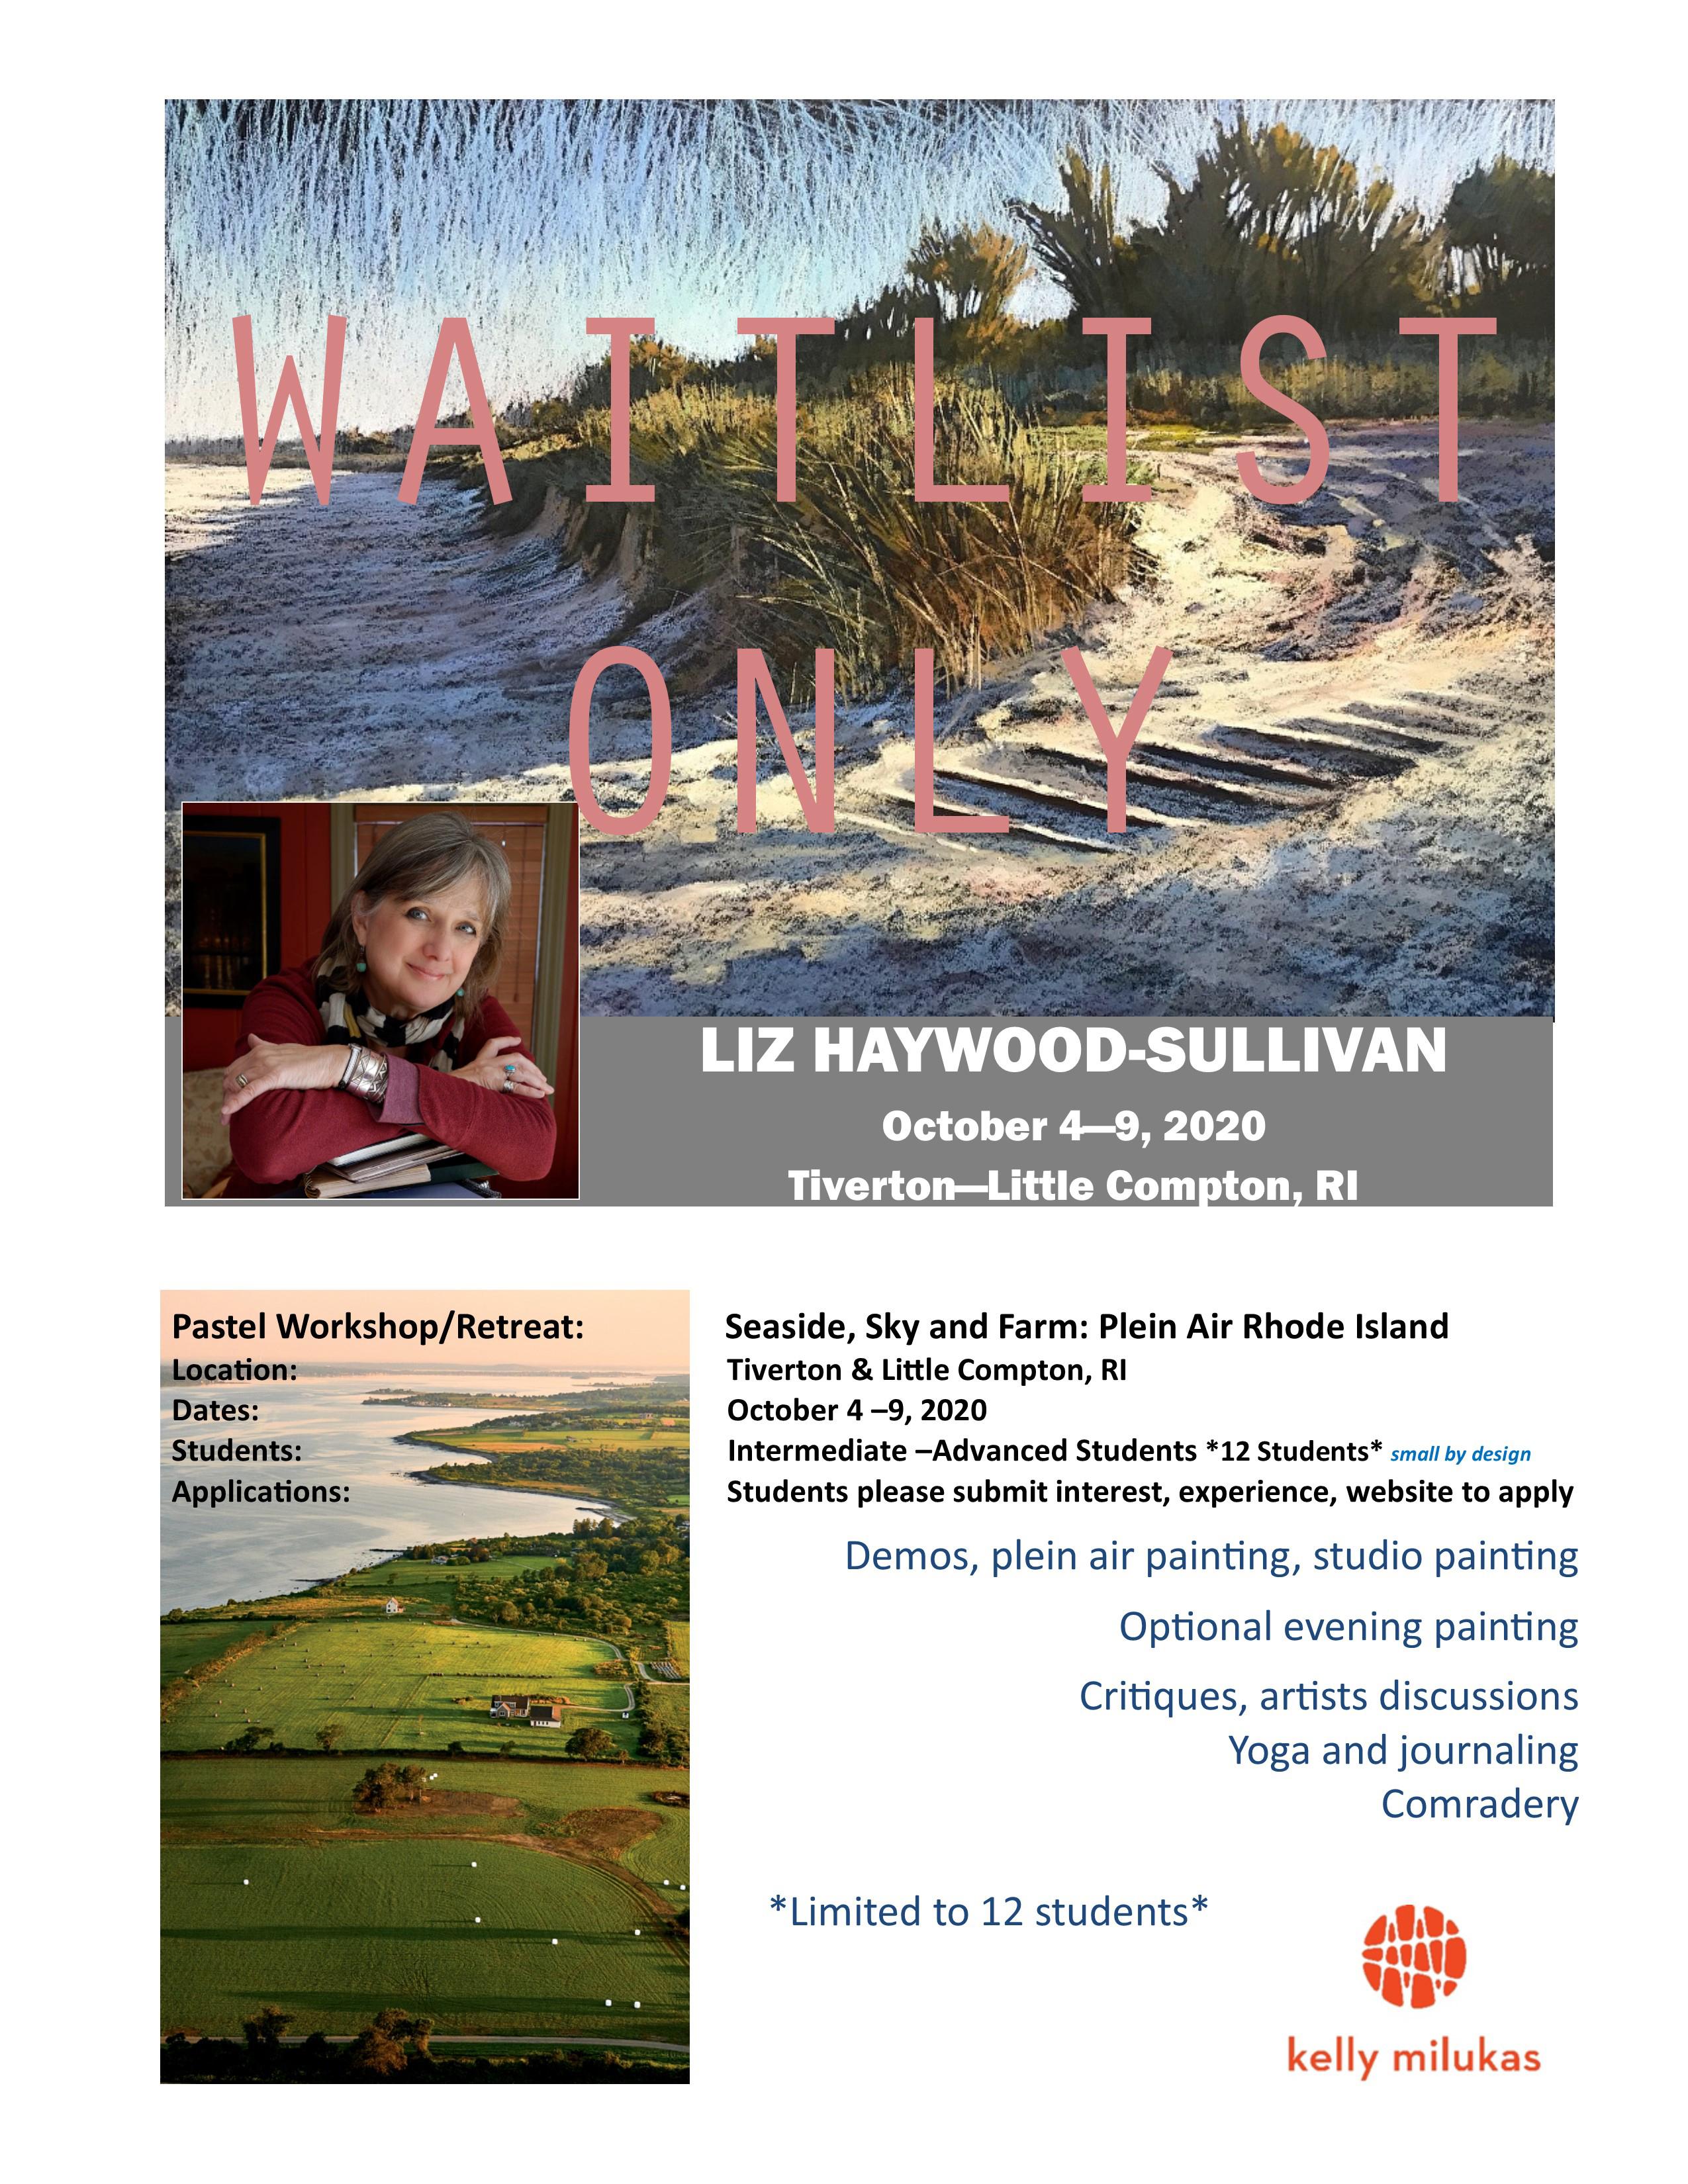 Liz Haywood-Sullivan Pastel Workshop & Retreat